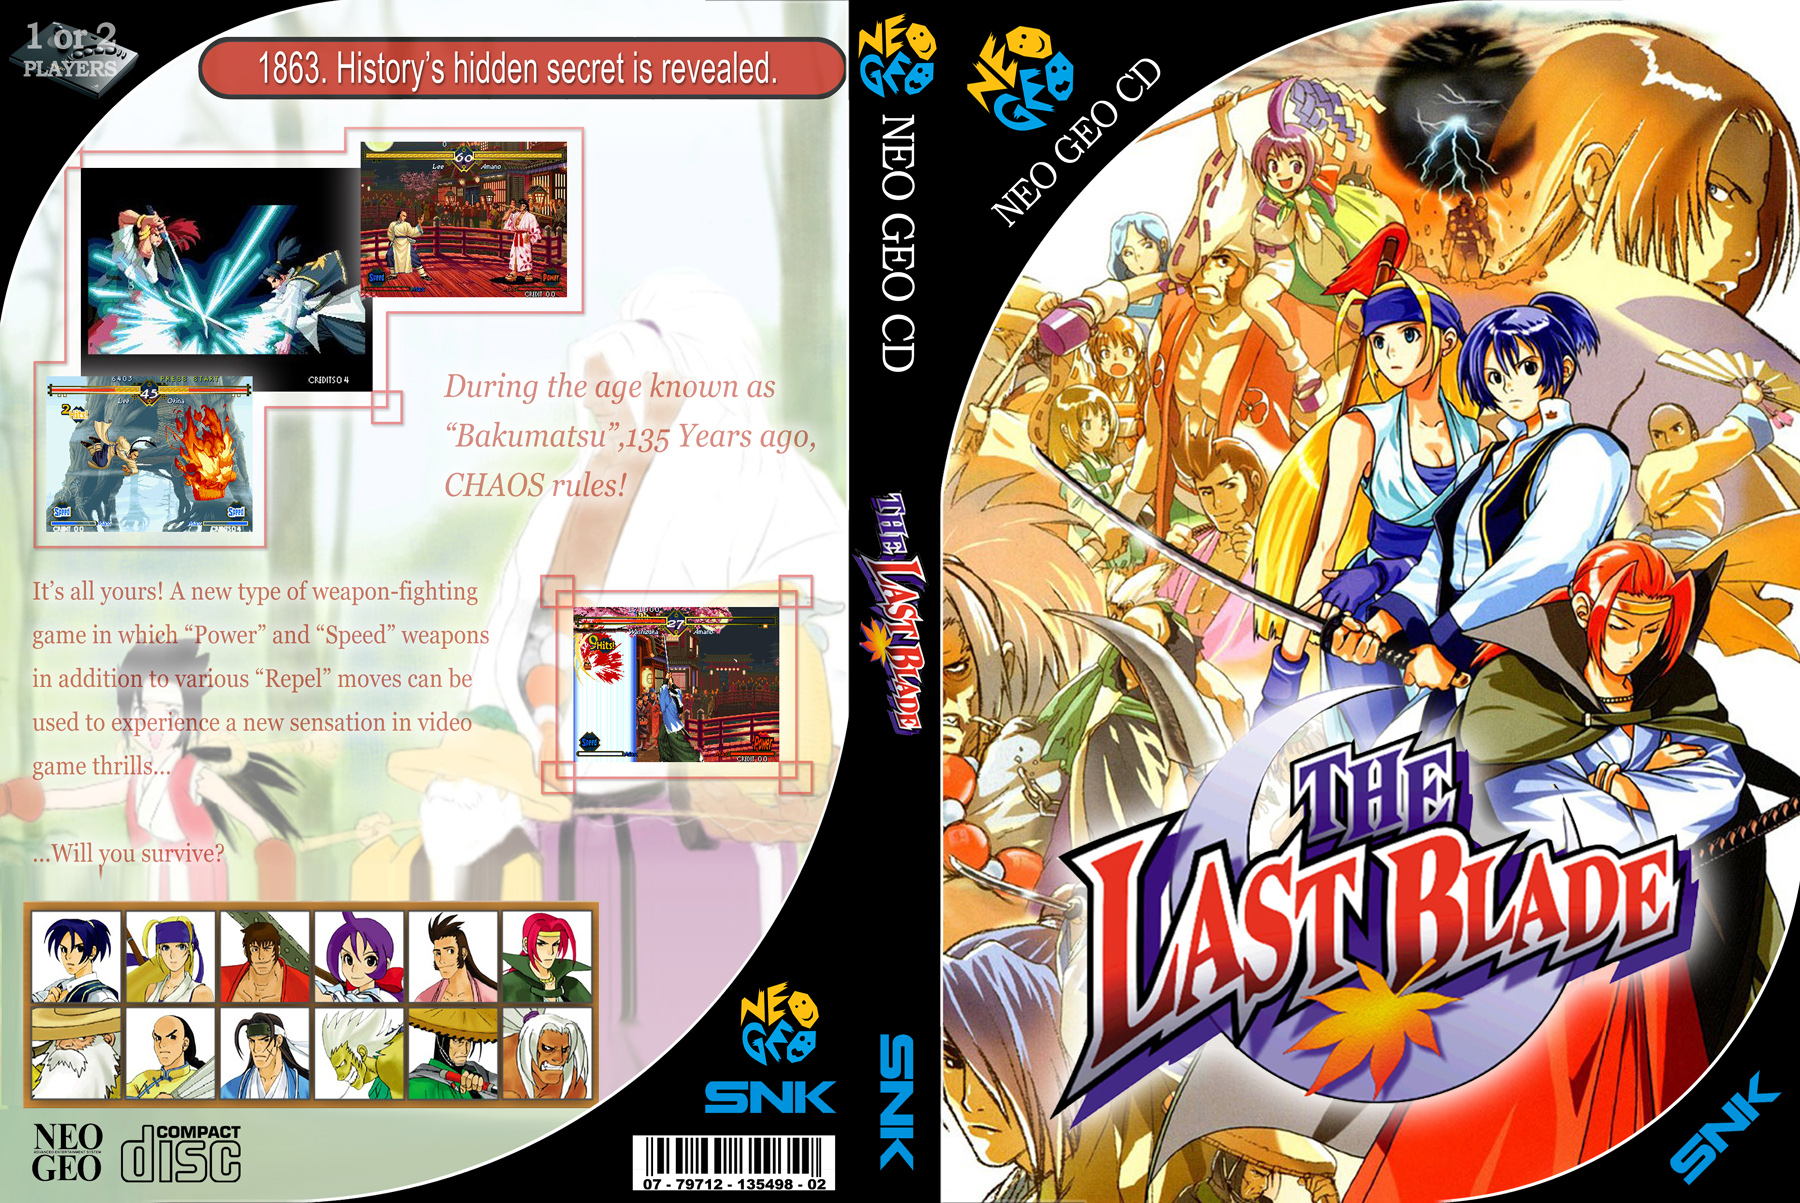 NeoGeo CD - Last Blade